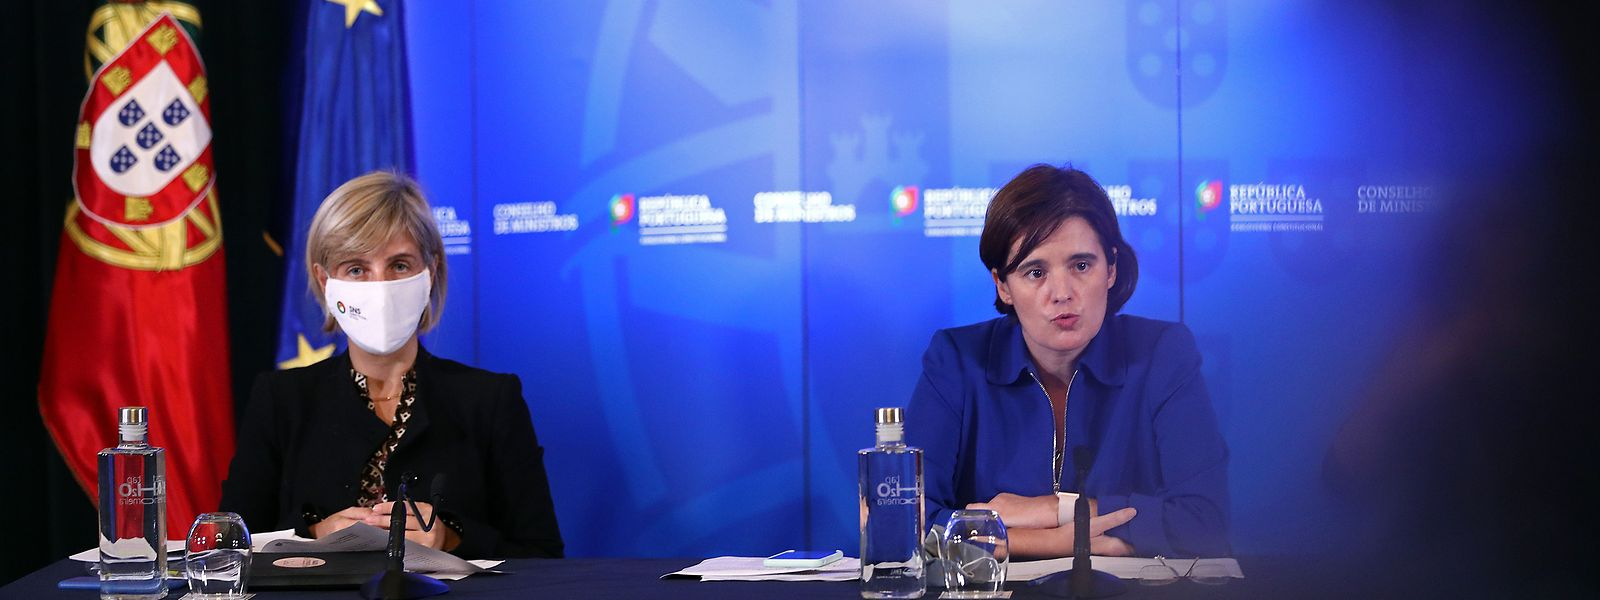 A ministra da Saúde, Marta Temido (E), e a ministra de Estado e da Presidência, Mariana Vieira da Silva (D).